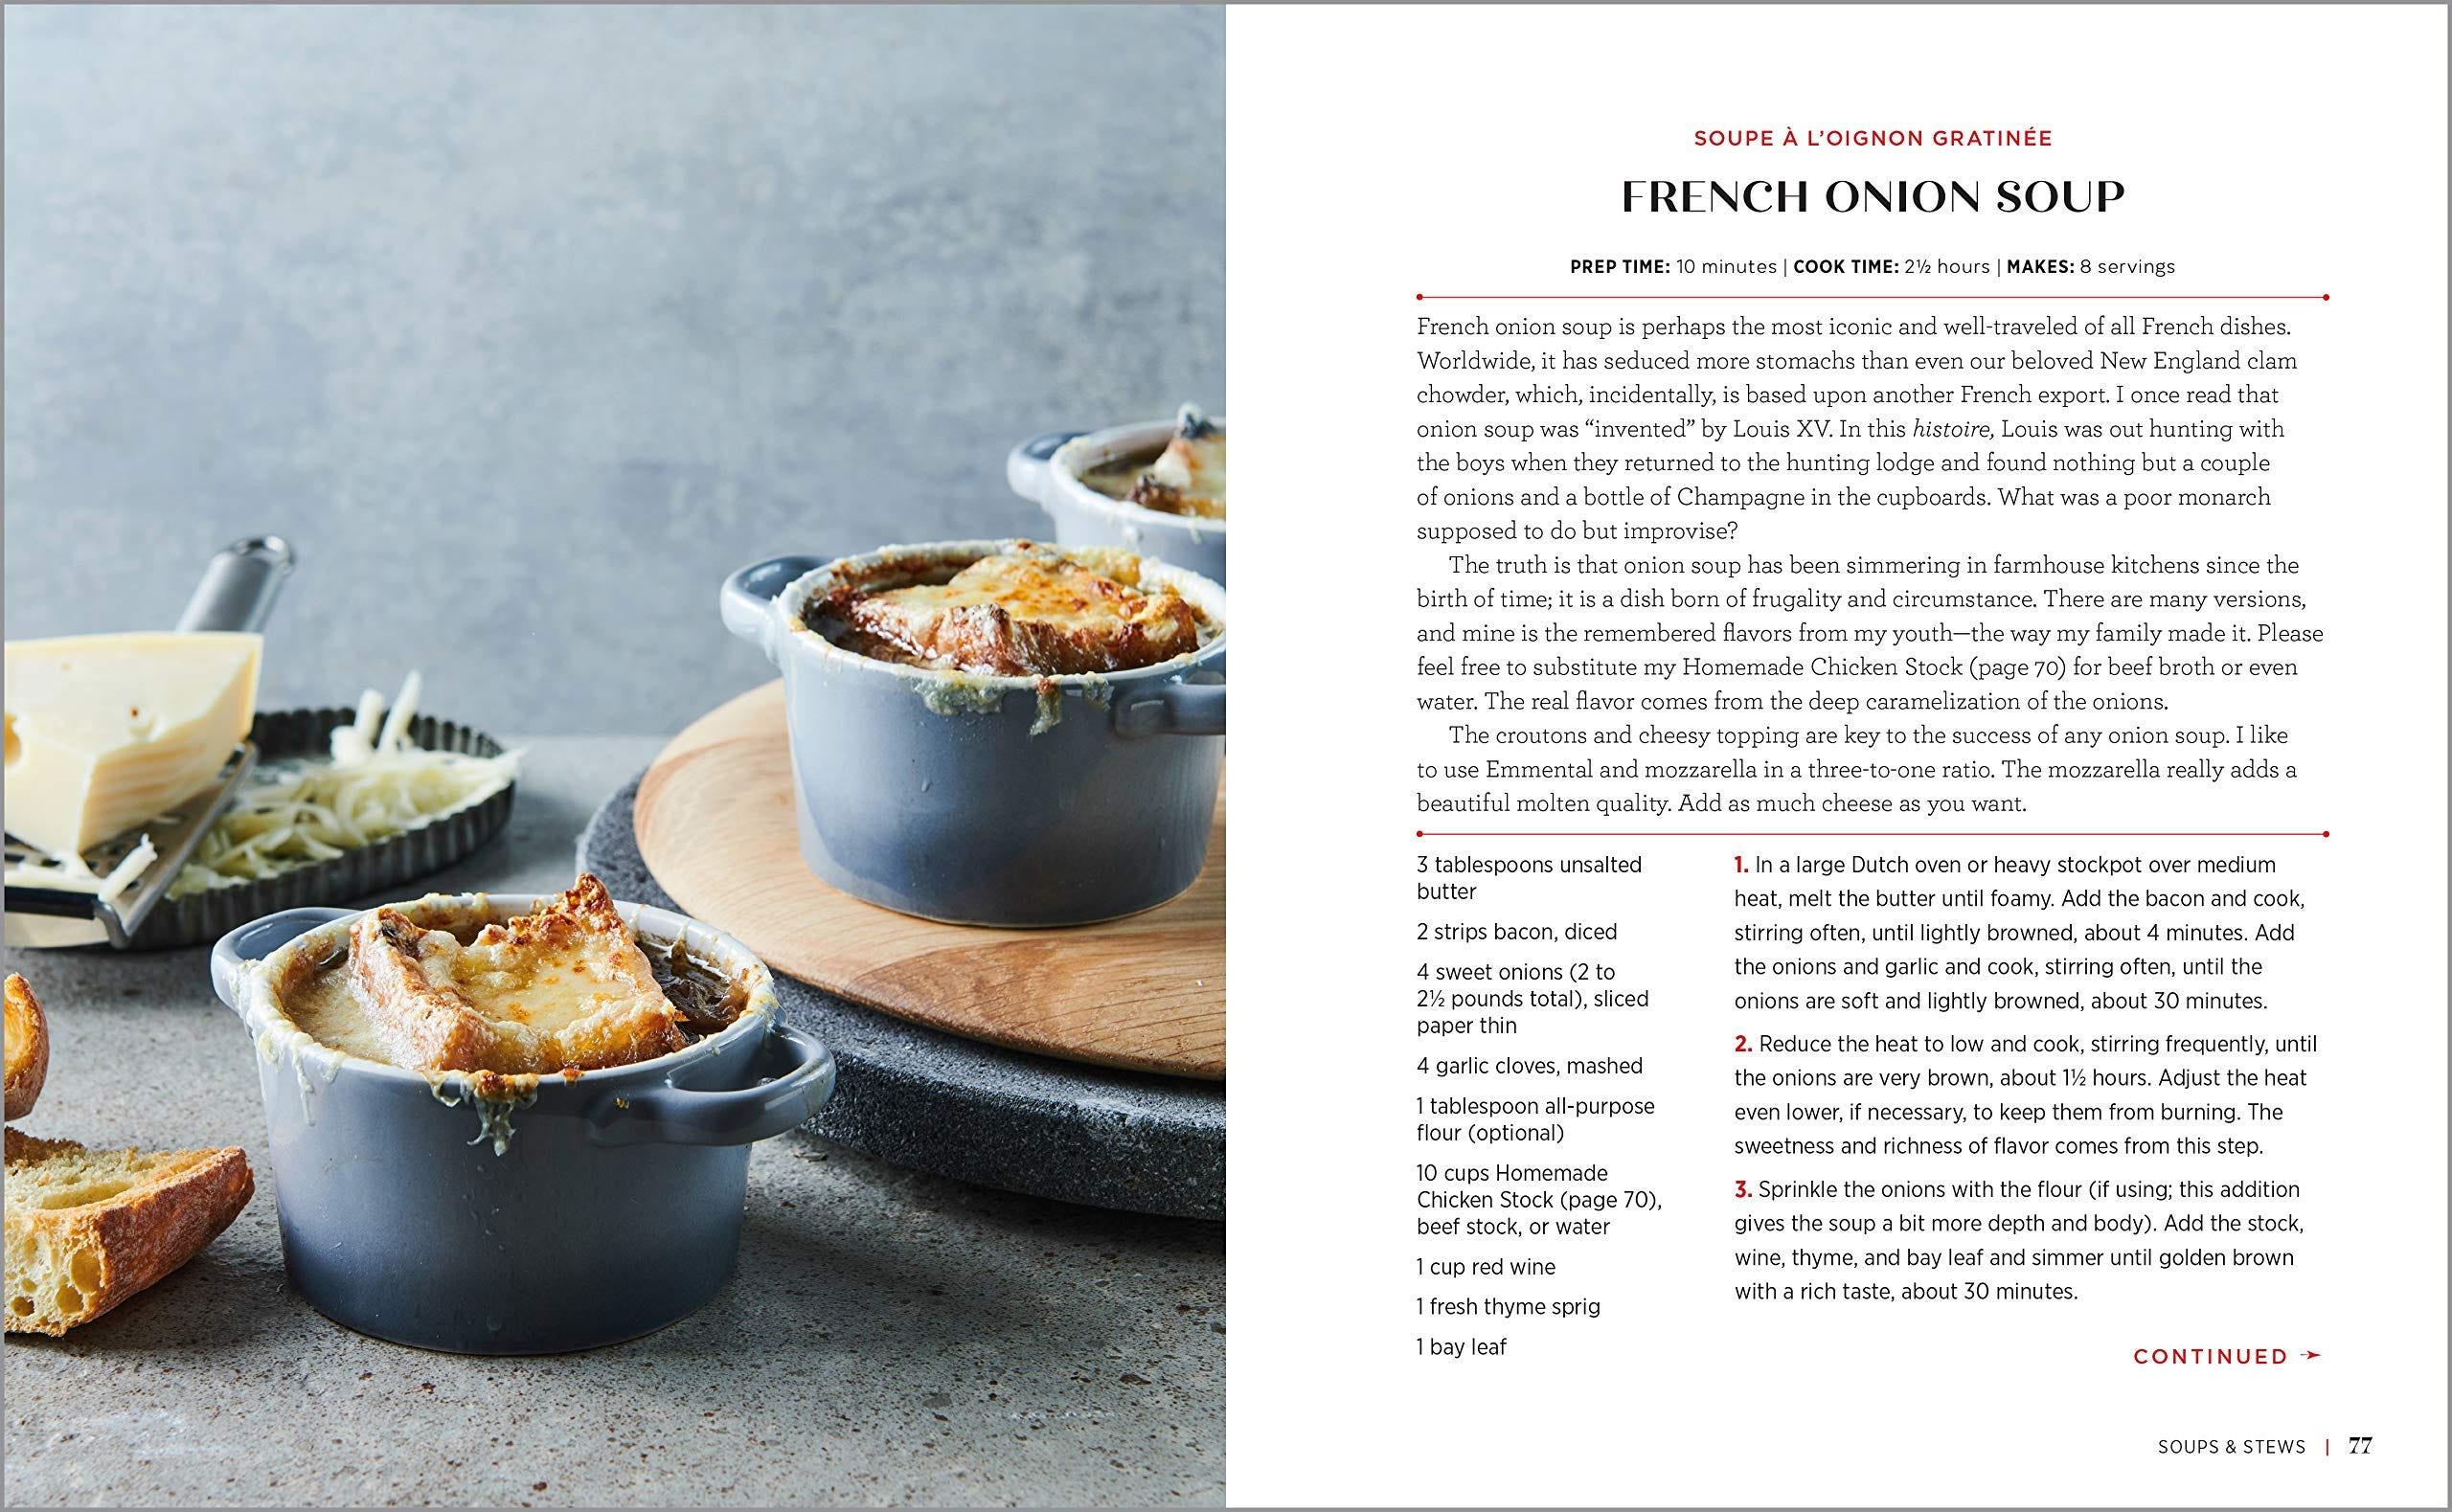 french onion soup recipe.